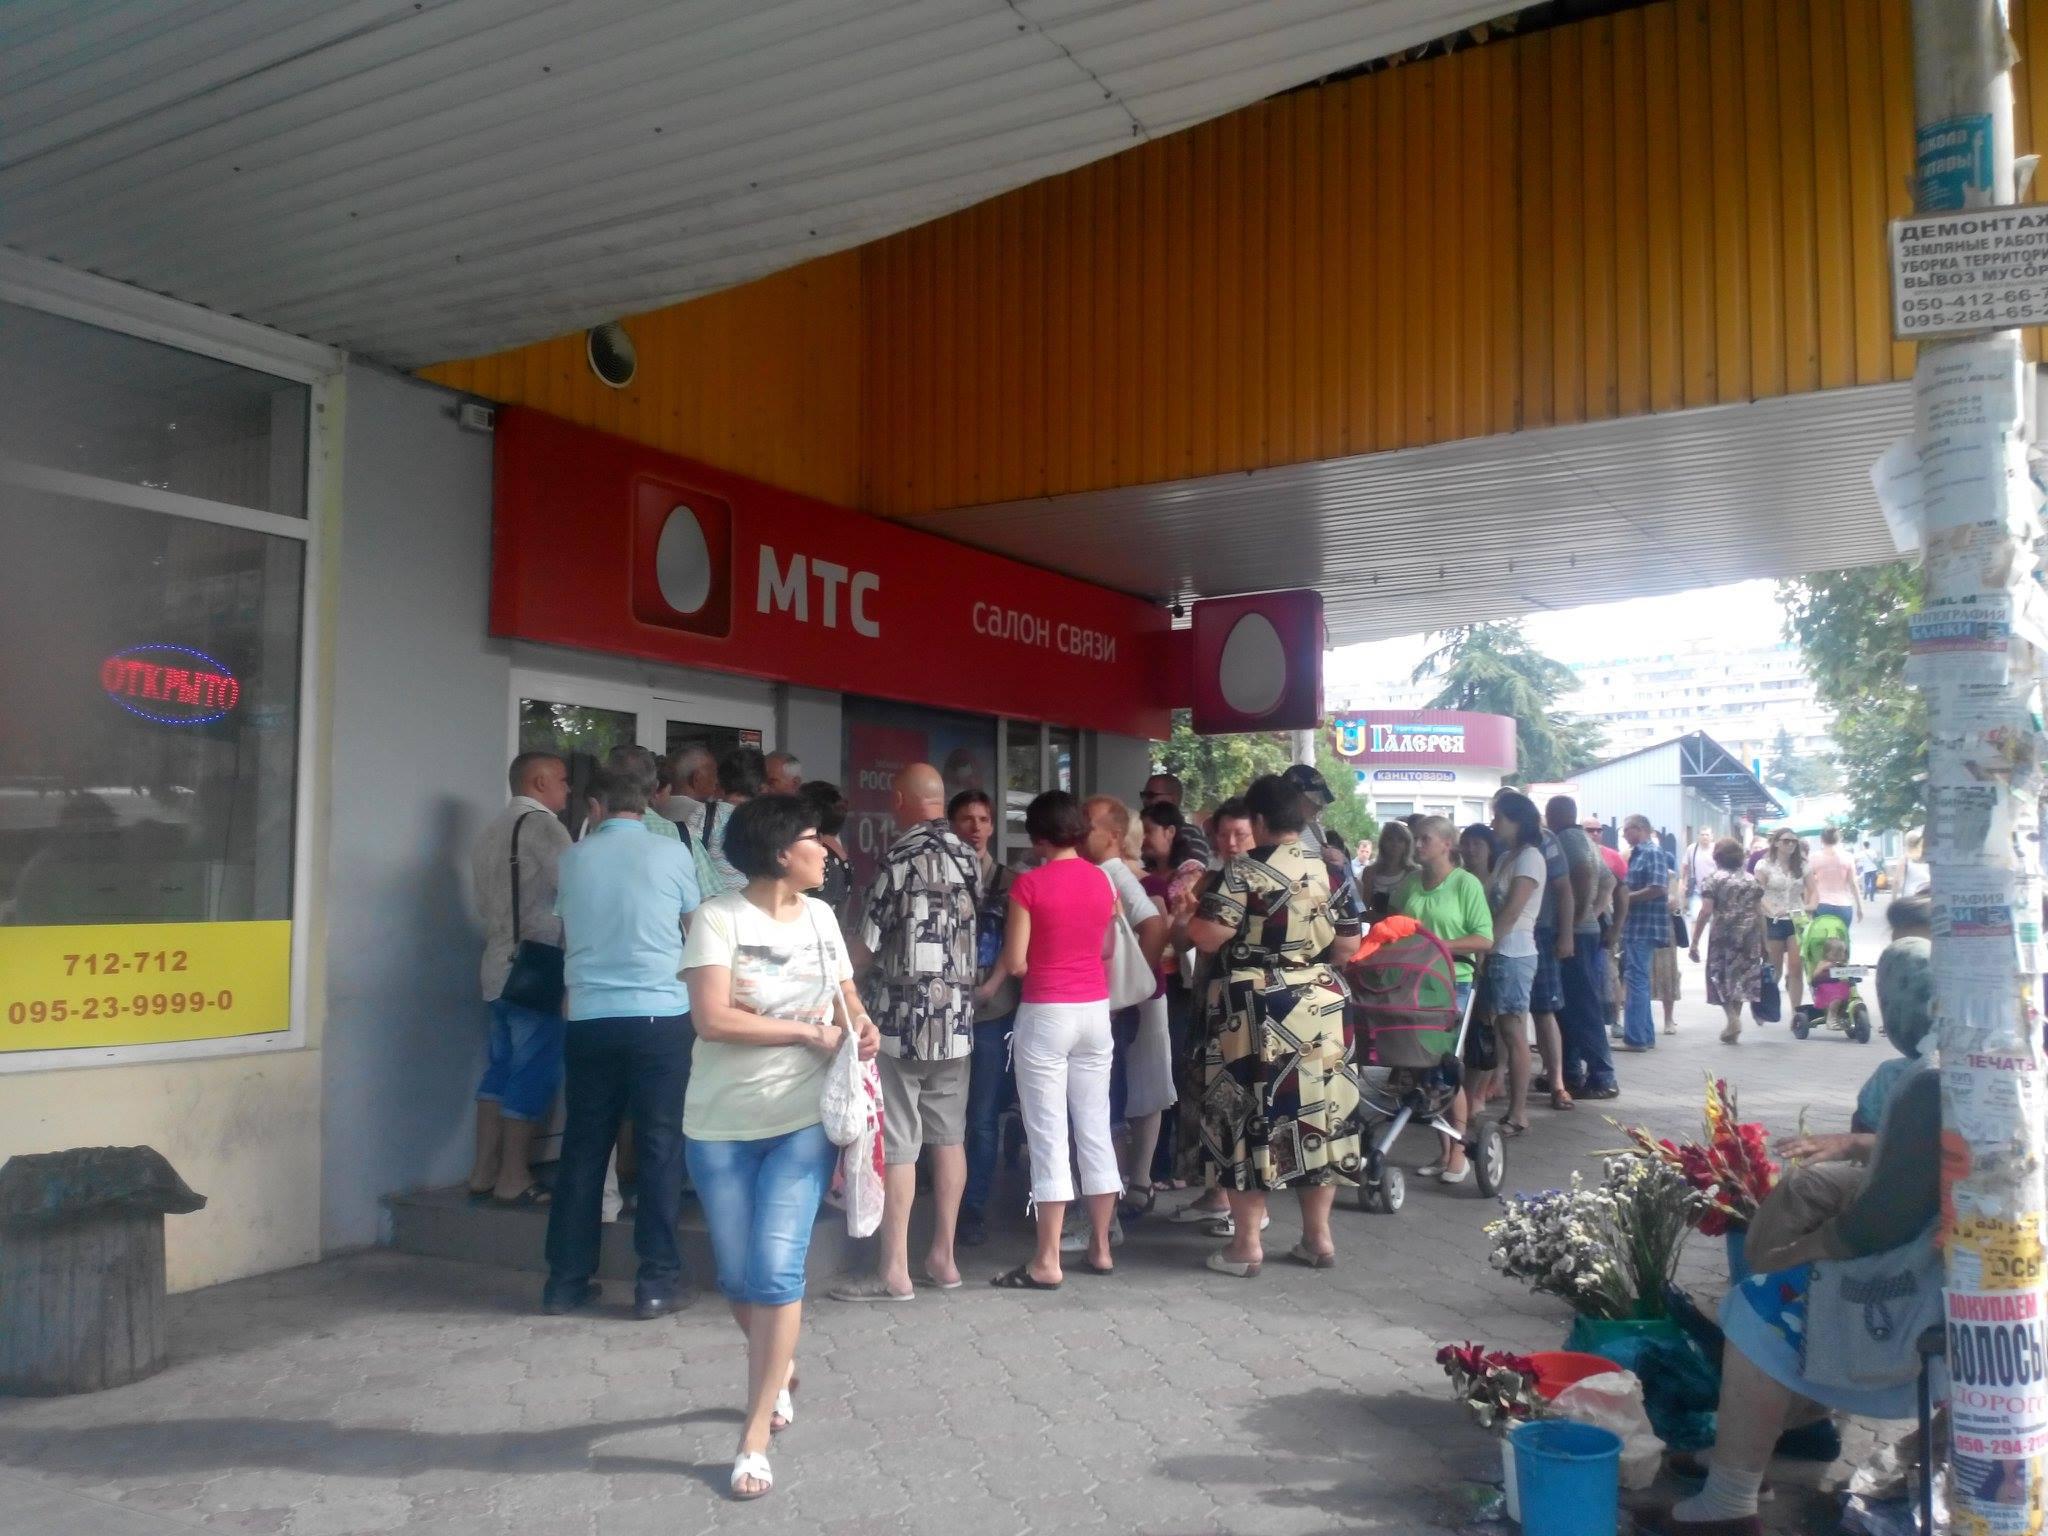 В Крыму отключили МТС